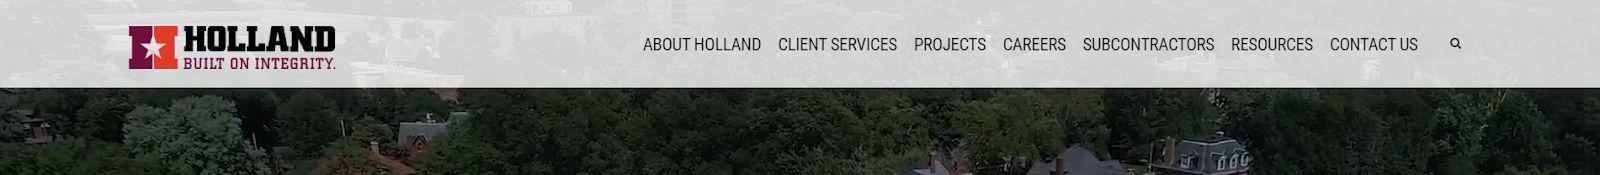 Construction Website Trends - Simple Navigation - Holland